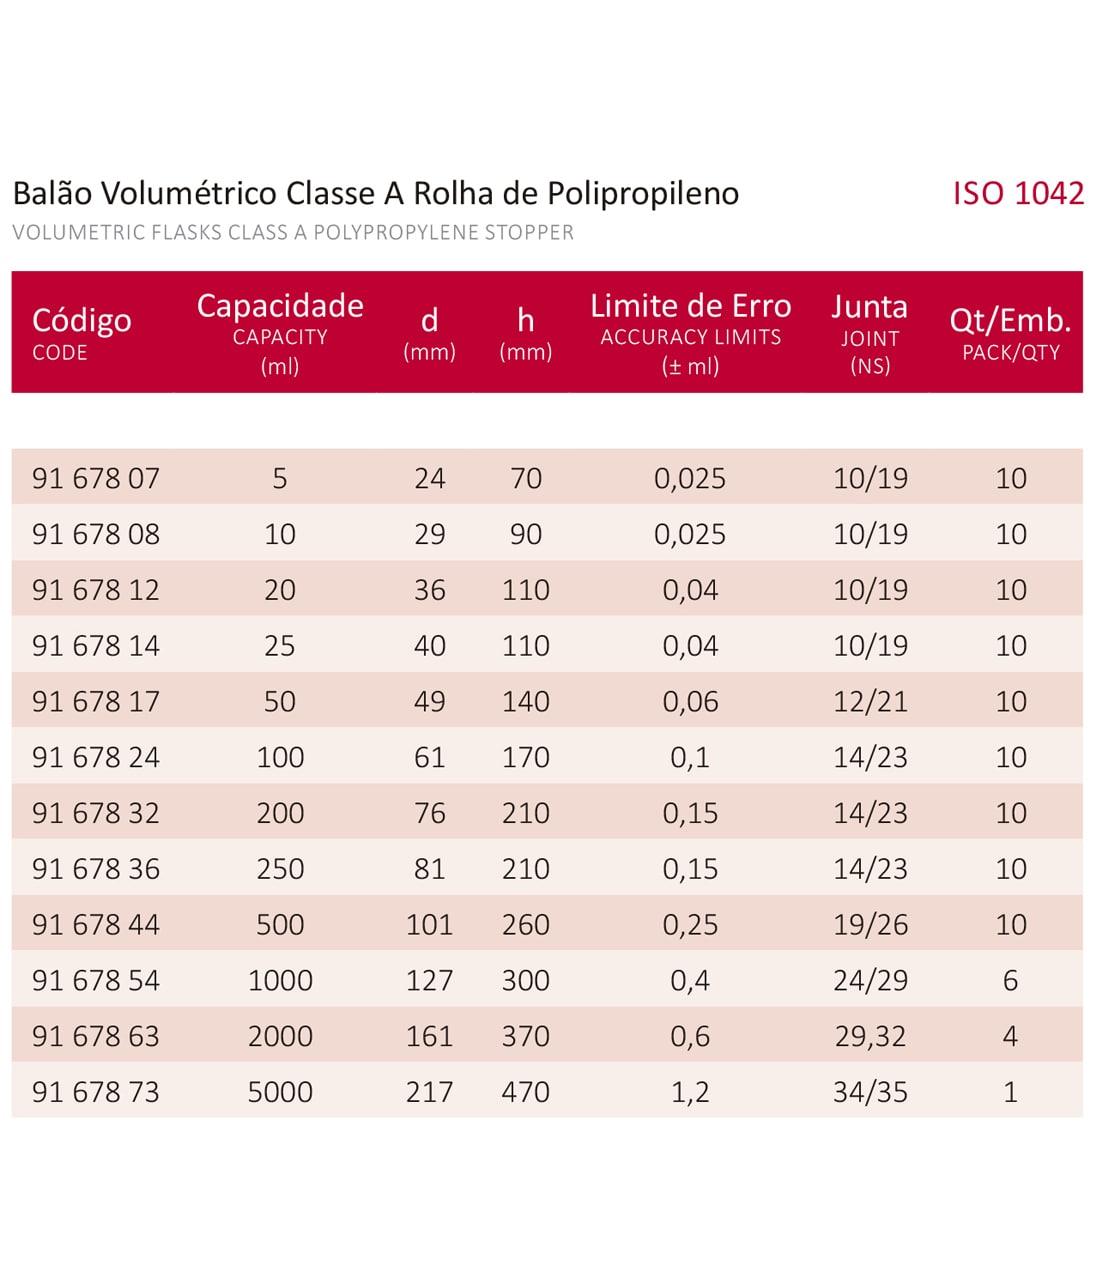 BALÃO VOLUMÉTRICO CLASSE A ROLHA POLI C/ CERTIFICADO RBC 250 ML - Marca Laborglas - Cód. 9167836-R